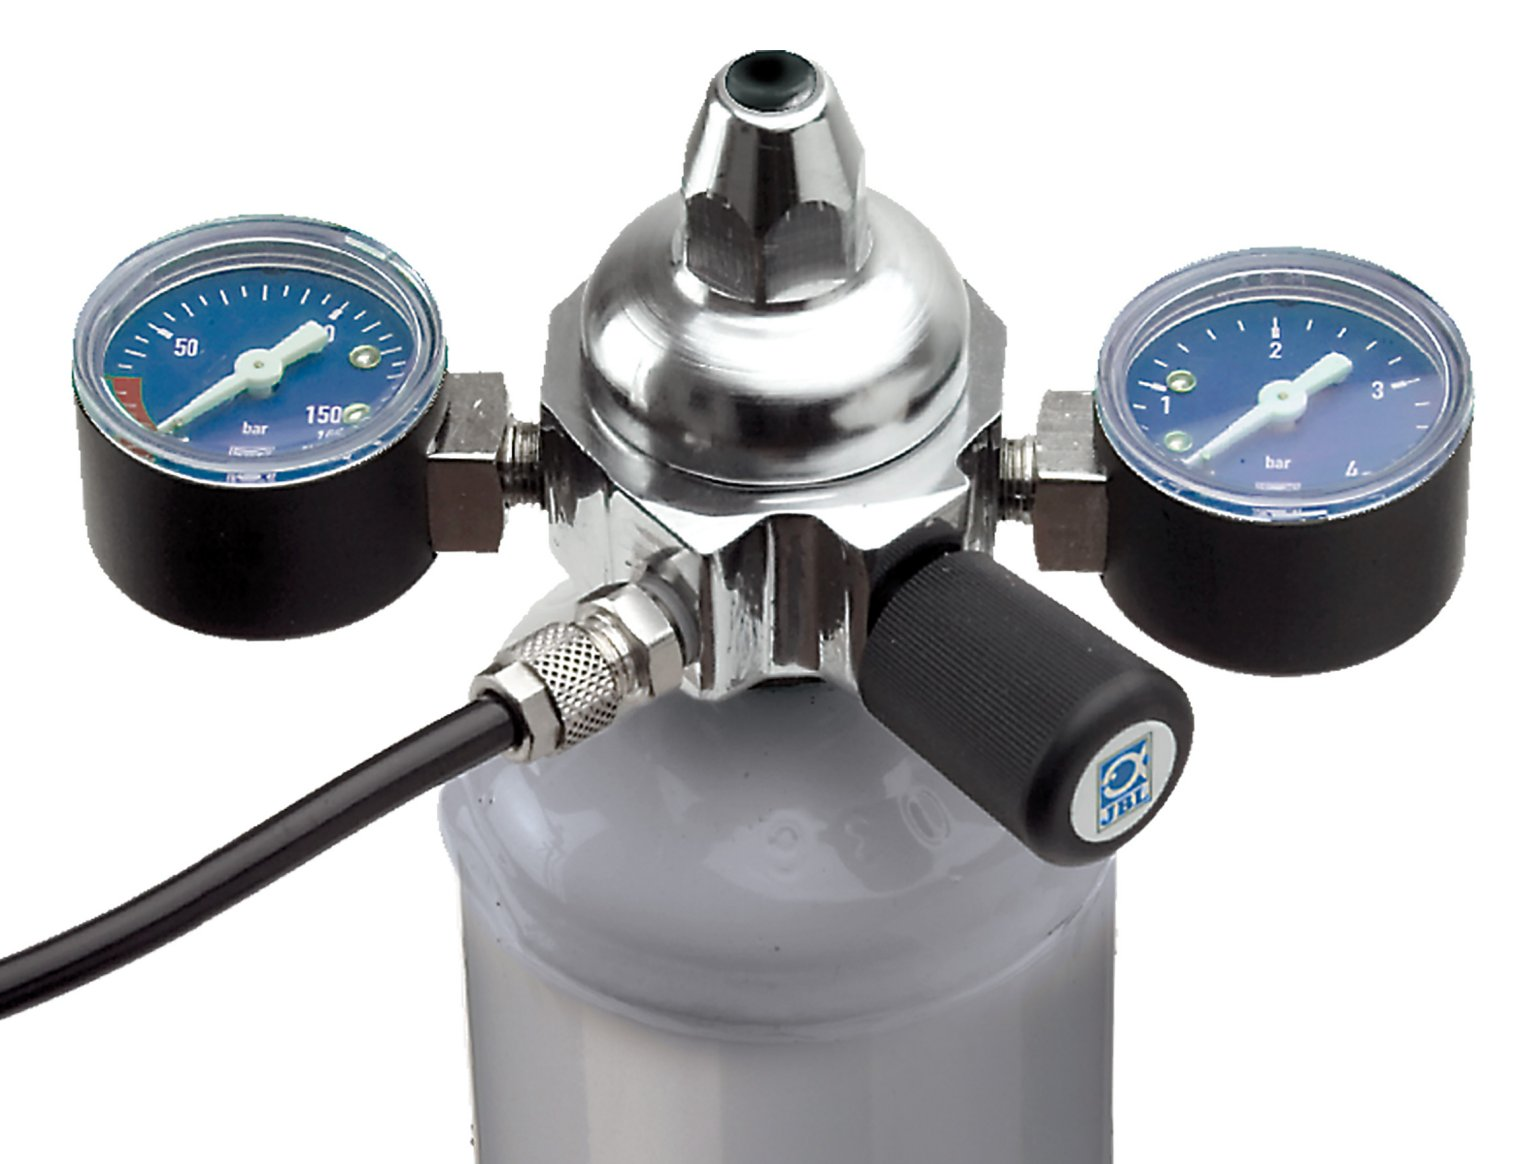 Shop JBL ProFlora u001 CO2 pressure regulator